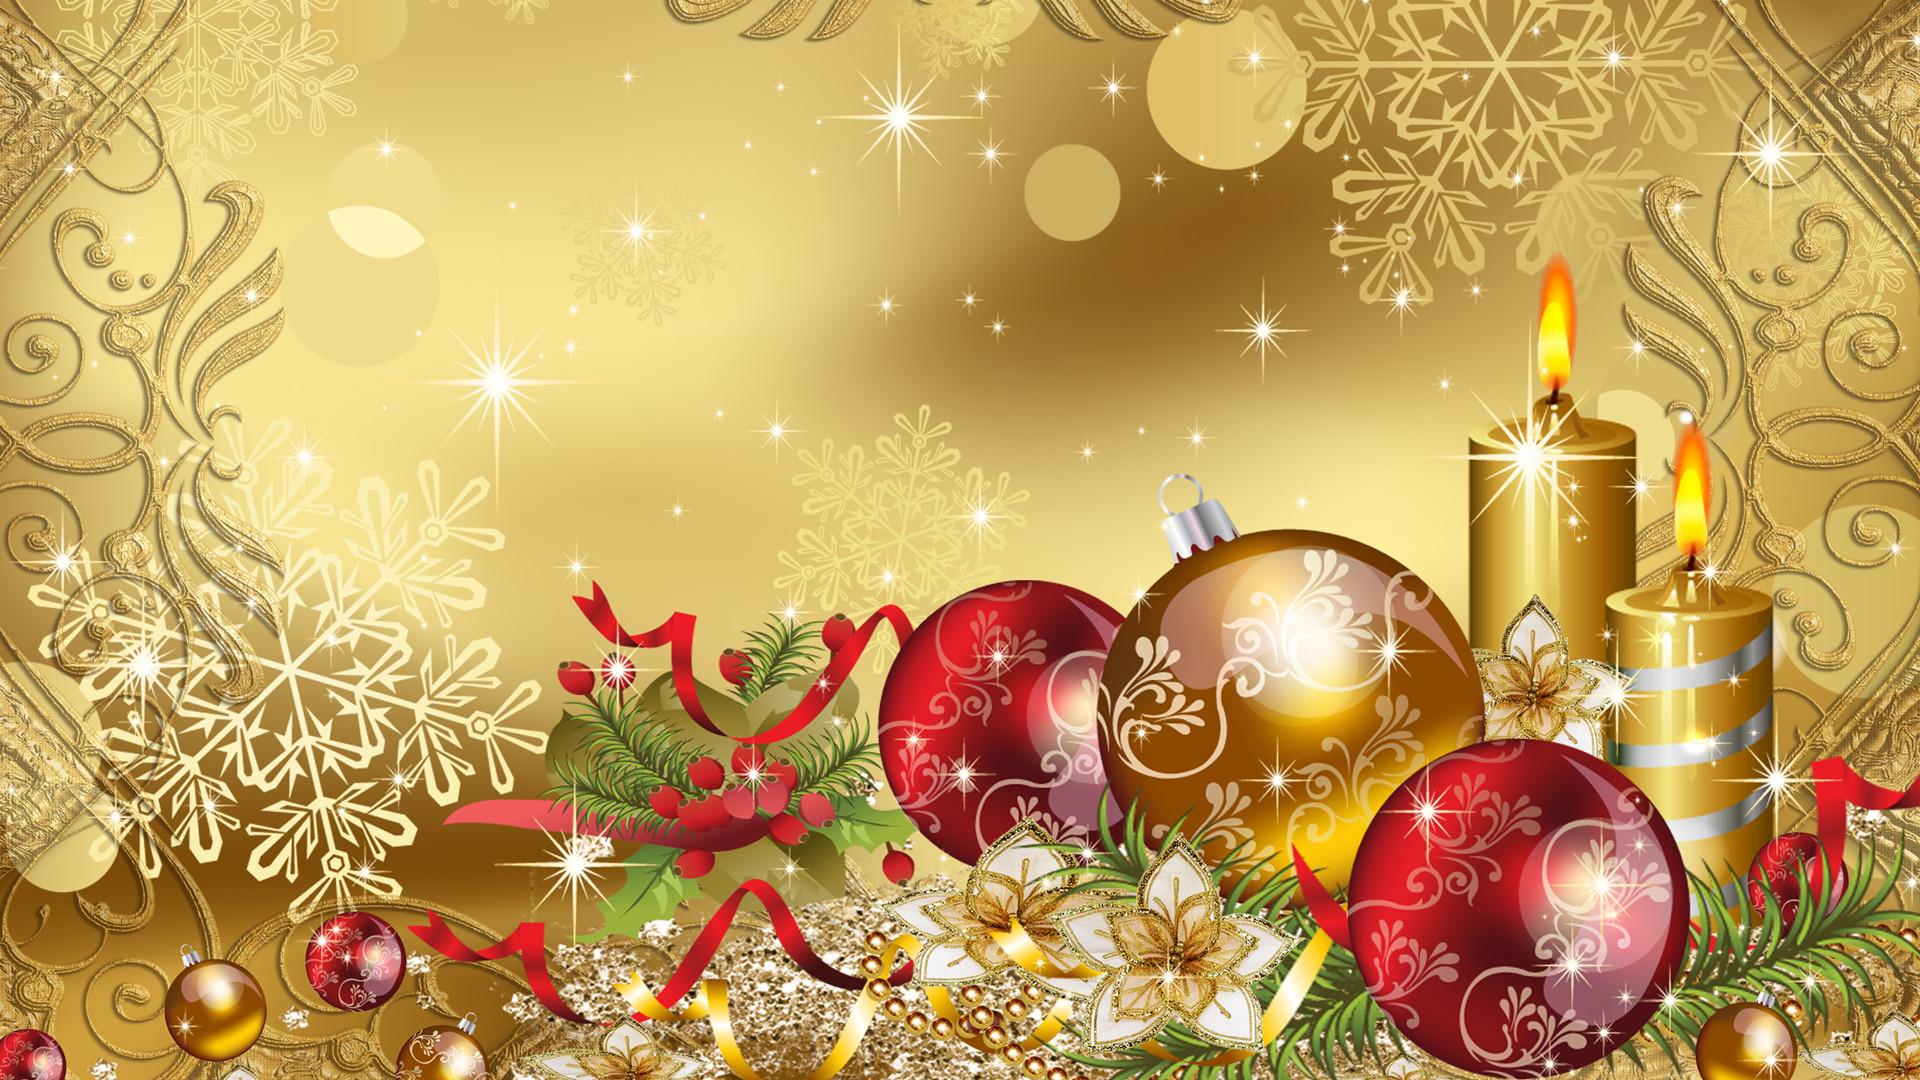 Christmas Desktop Backgrounds Wallpapers (66+ pictures)